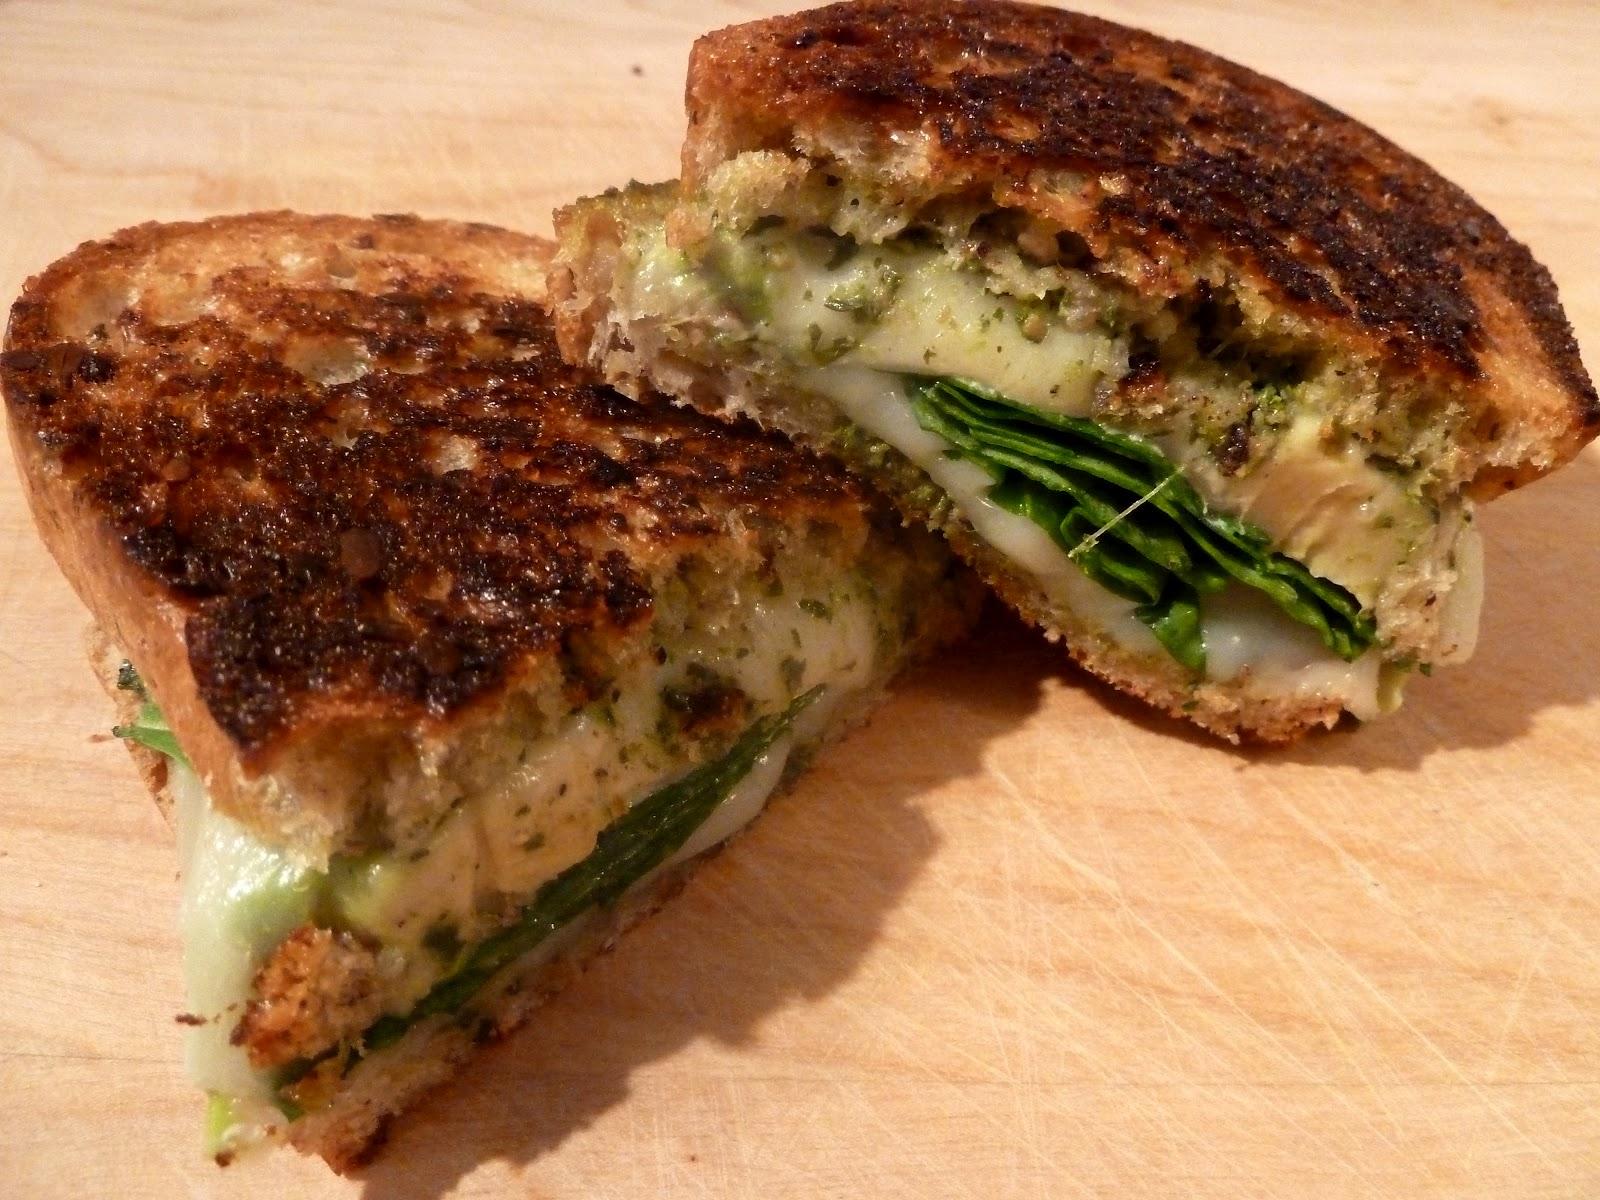 Spinach Pesto Grilled Cheese Sandwich Recipes — Dishmaps